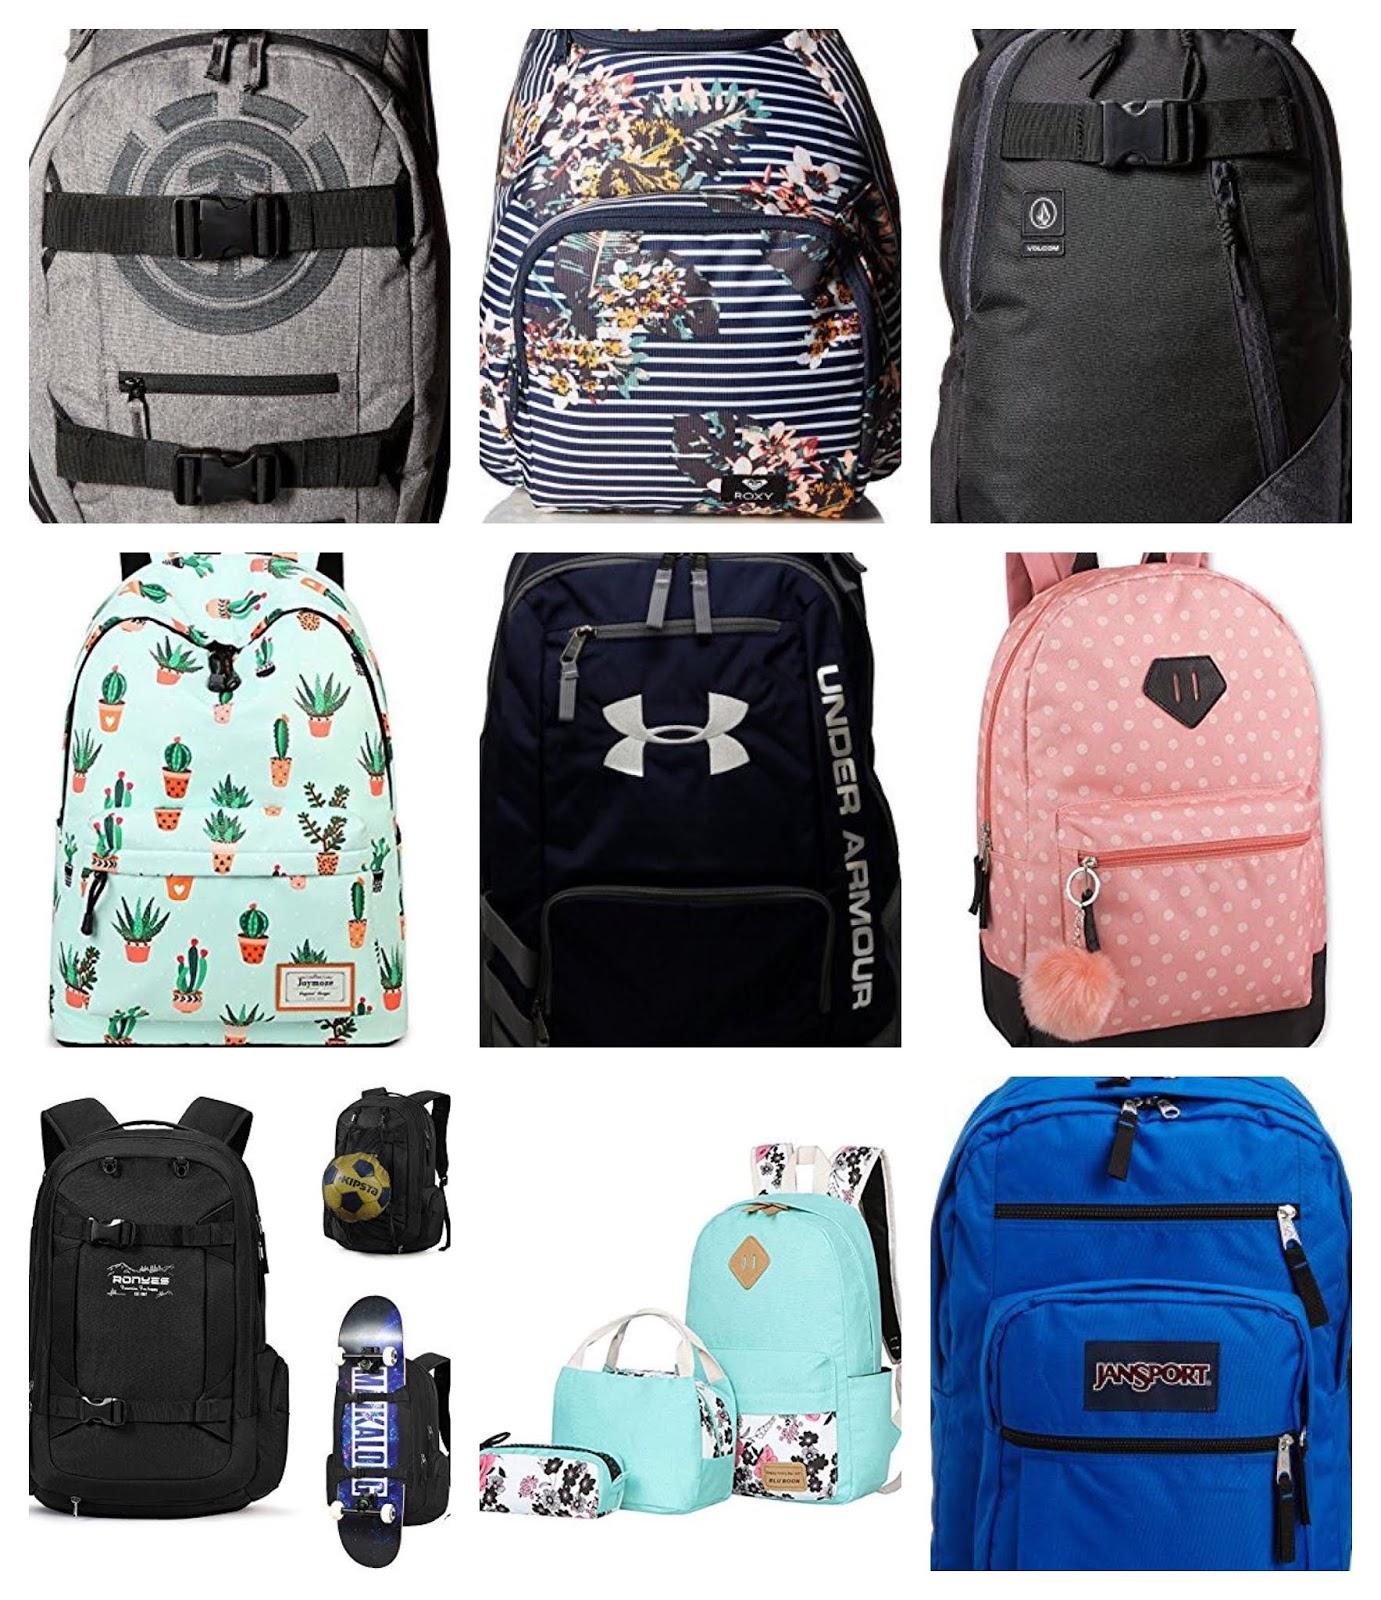 69eea5df40 Friday Finds: Backpacks · Rage Against the Minivan - 10M ago. 1. Element  Unisex Mohave Skateboard School Backpack